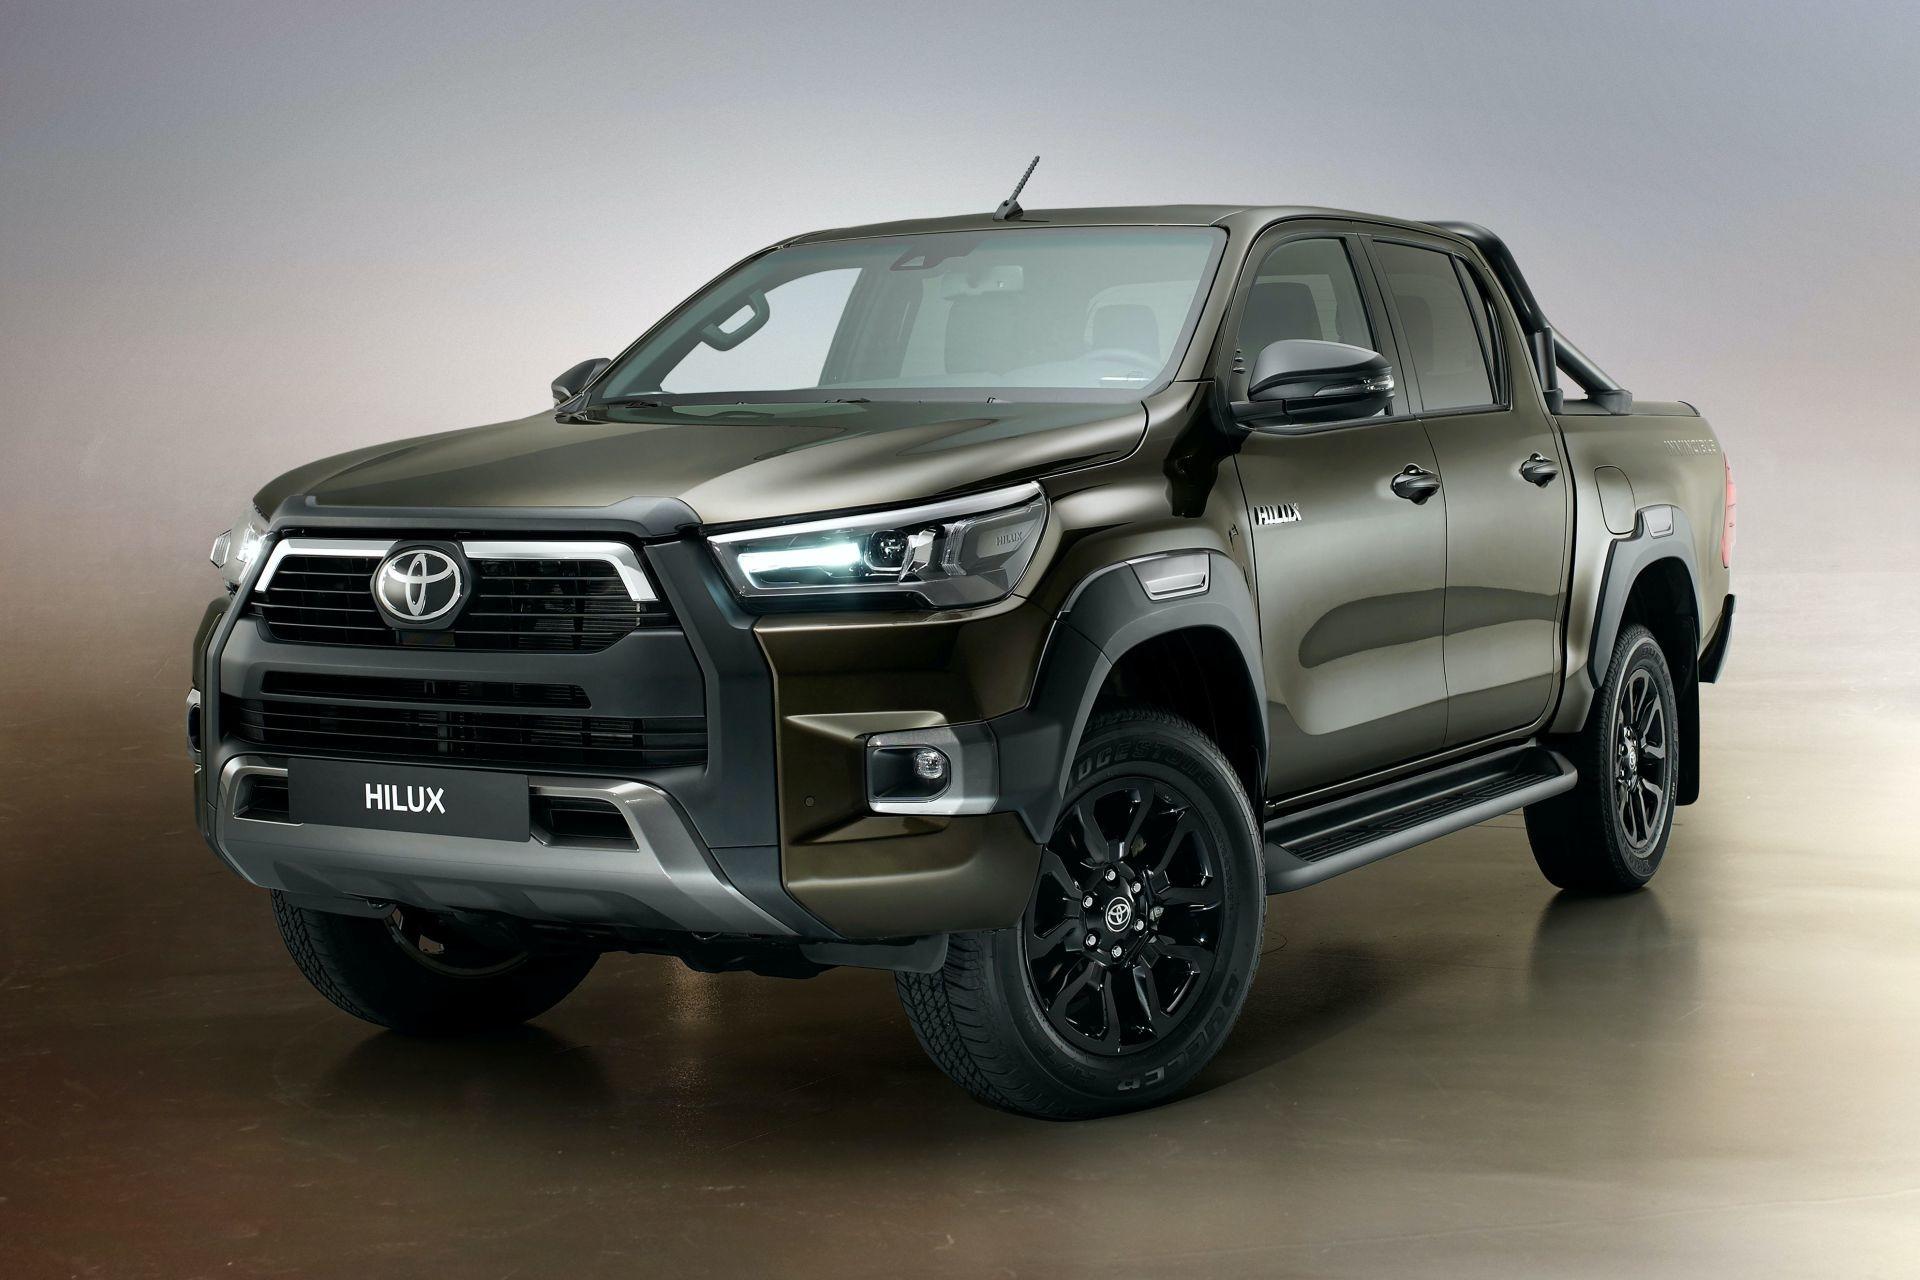 Toyota prepara una nueva Hilux: ¿se viene otra GR-Sport? | Garantia Plus